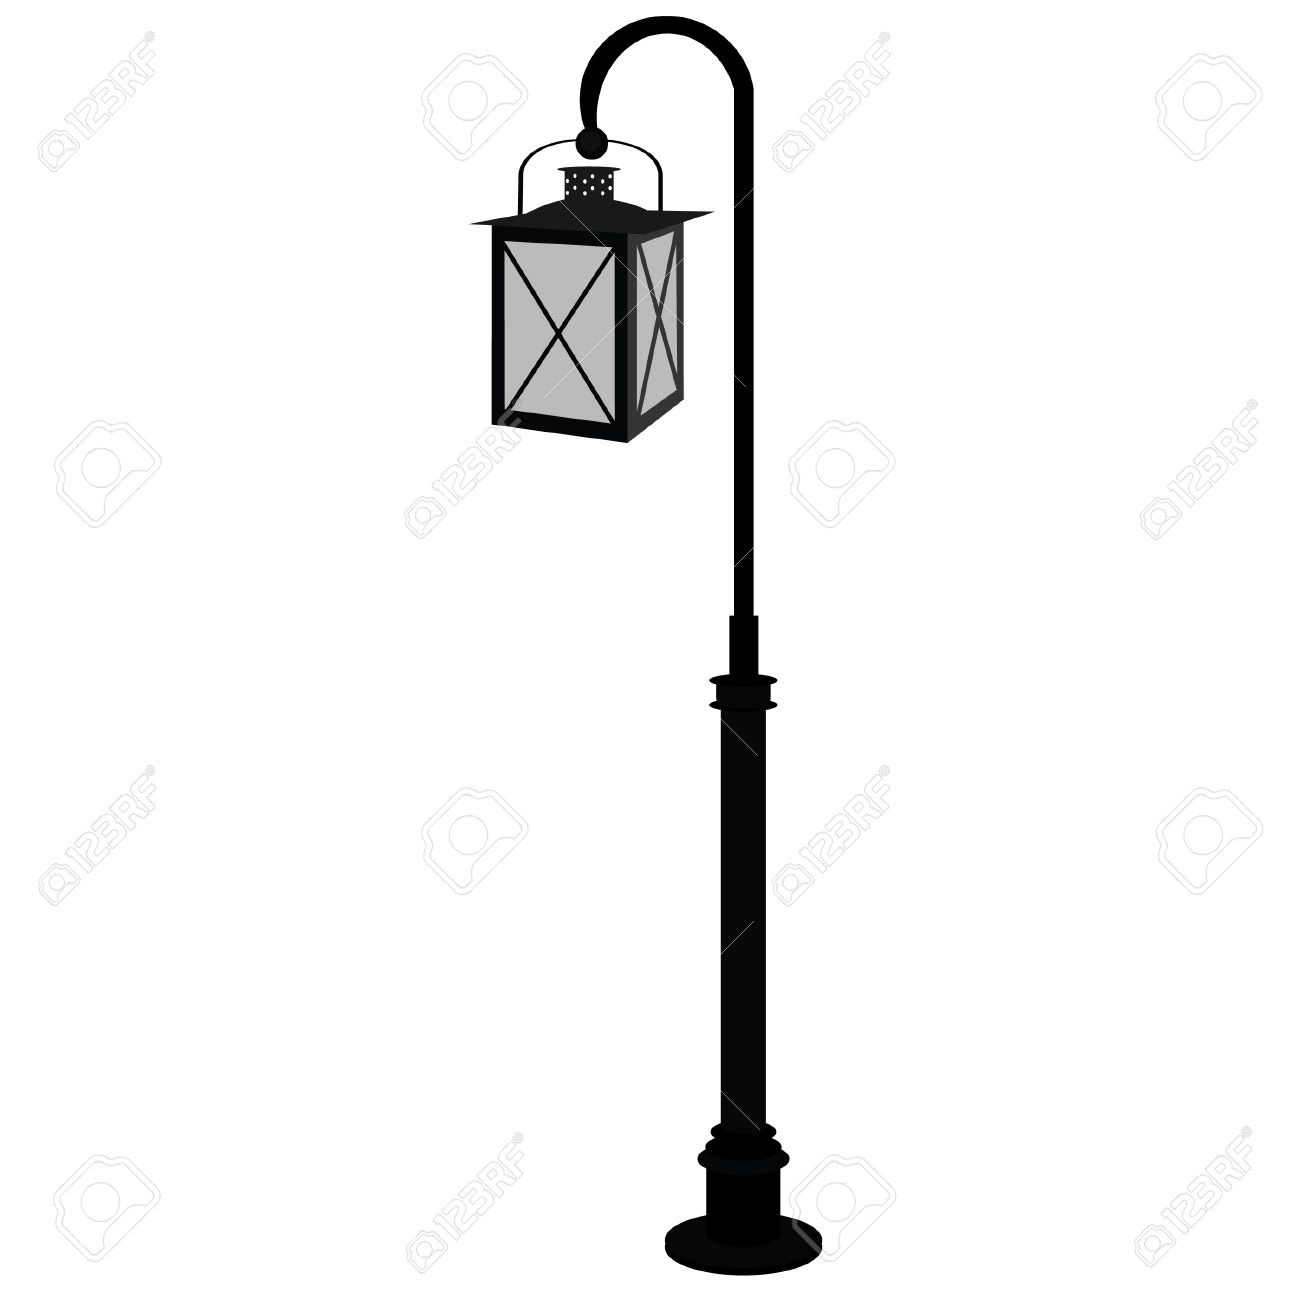 Black Street Lamp Vector Isolated, Antique Street Light, Vintage, Lampost  Stock Vector